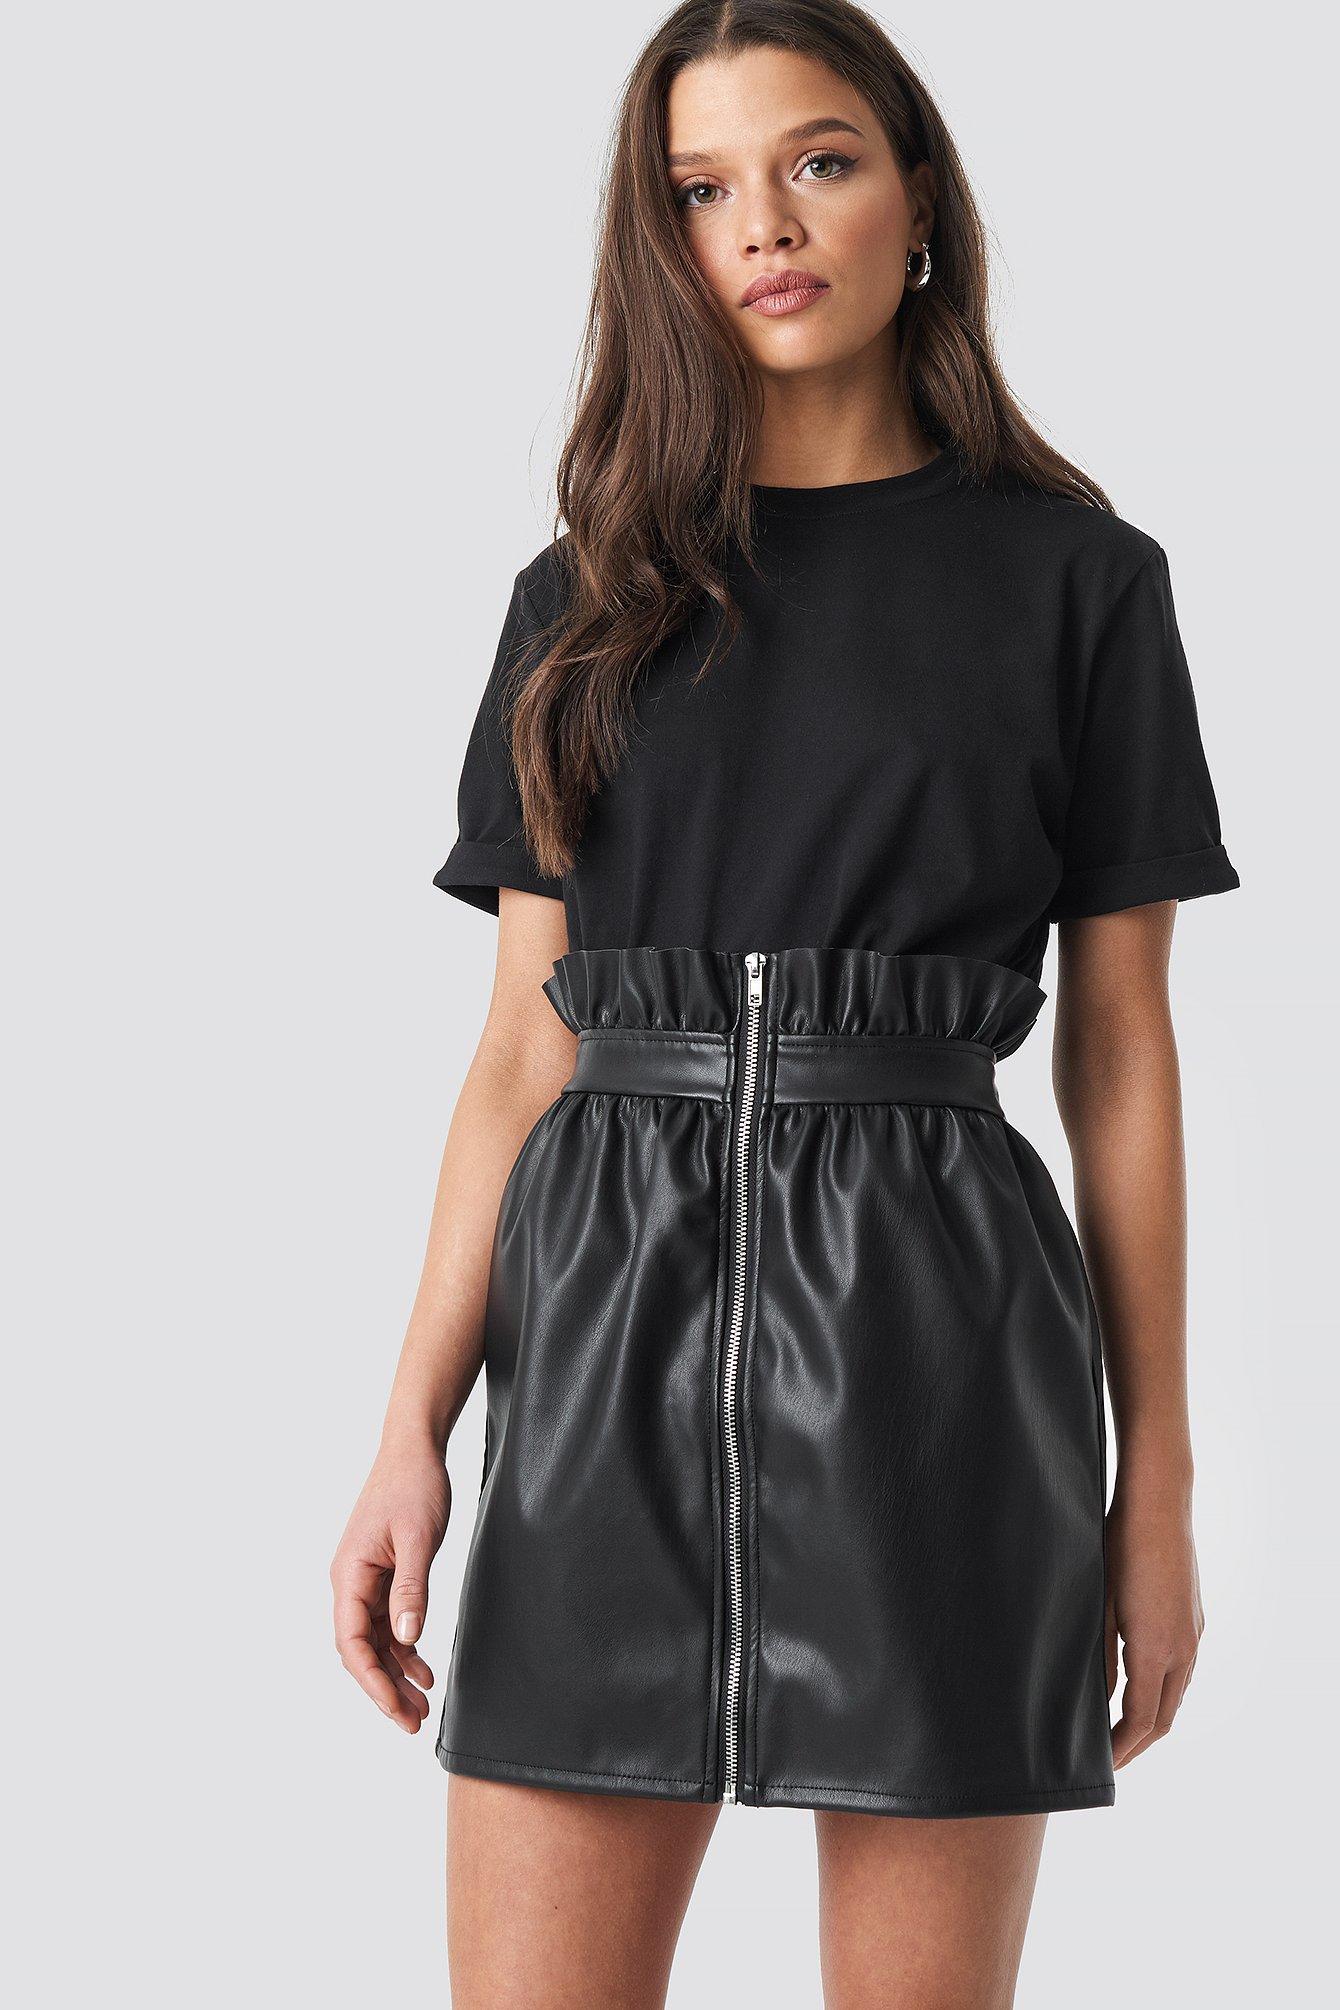 linn ahlborg x na-kd -  PU Leather Skirt - Black